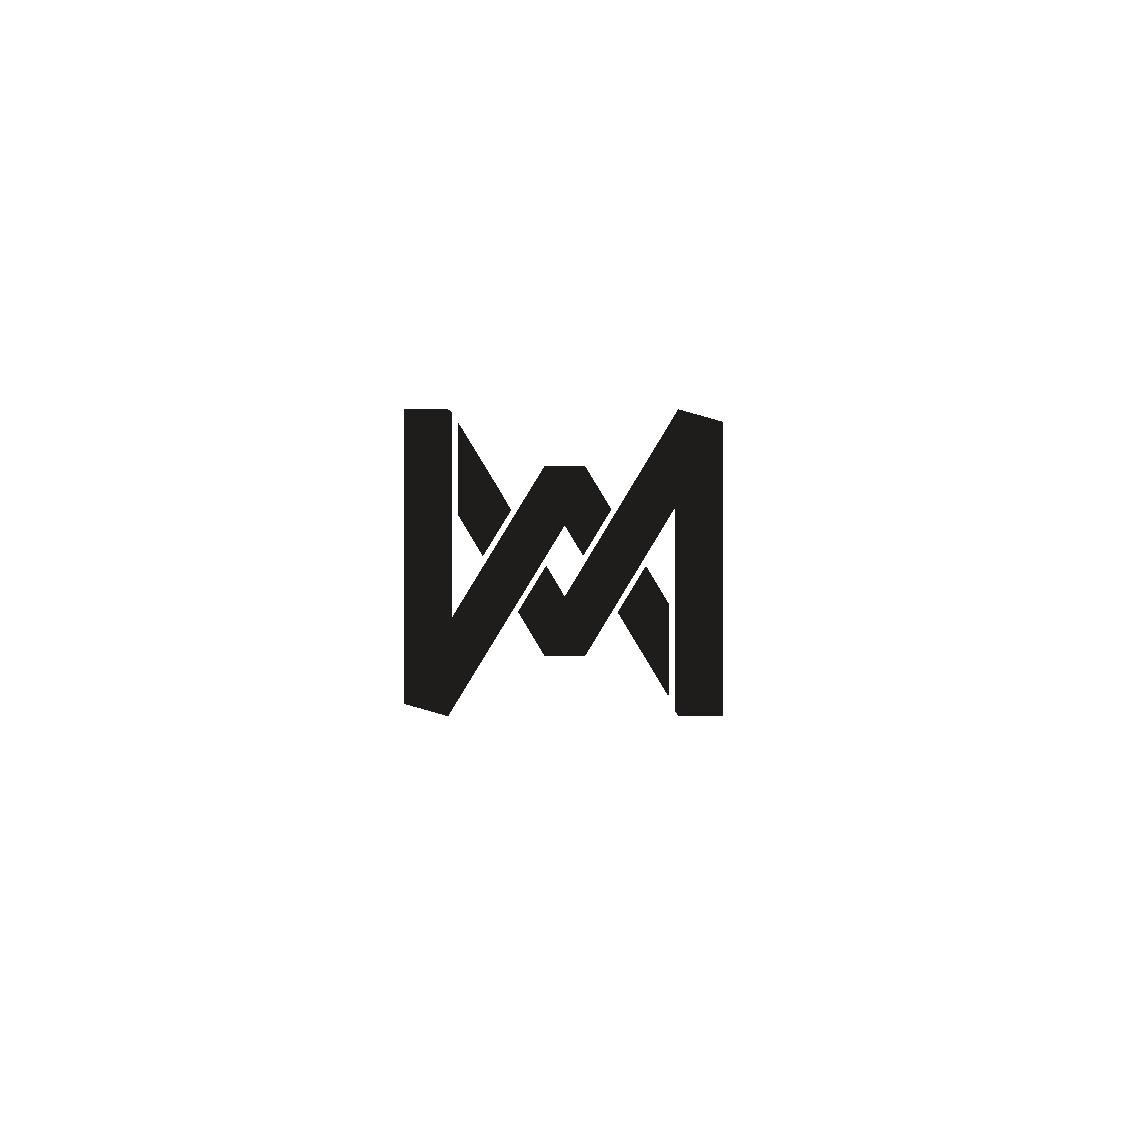 wolfmtn-09.png